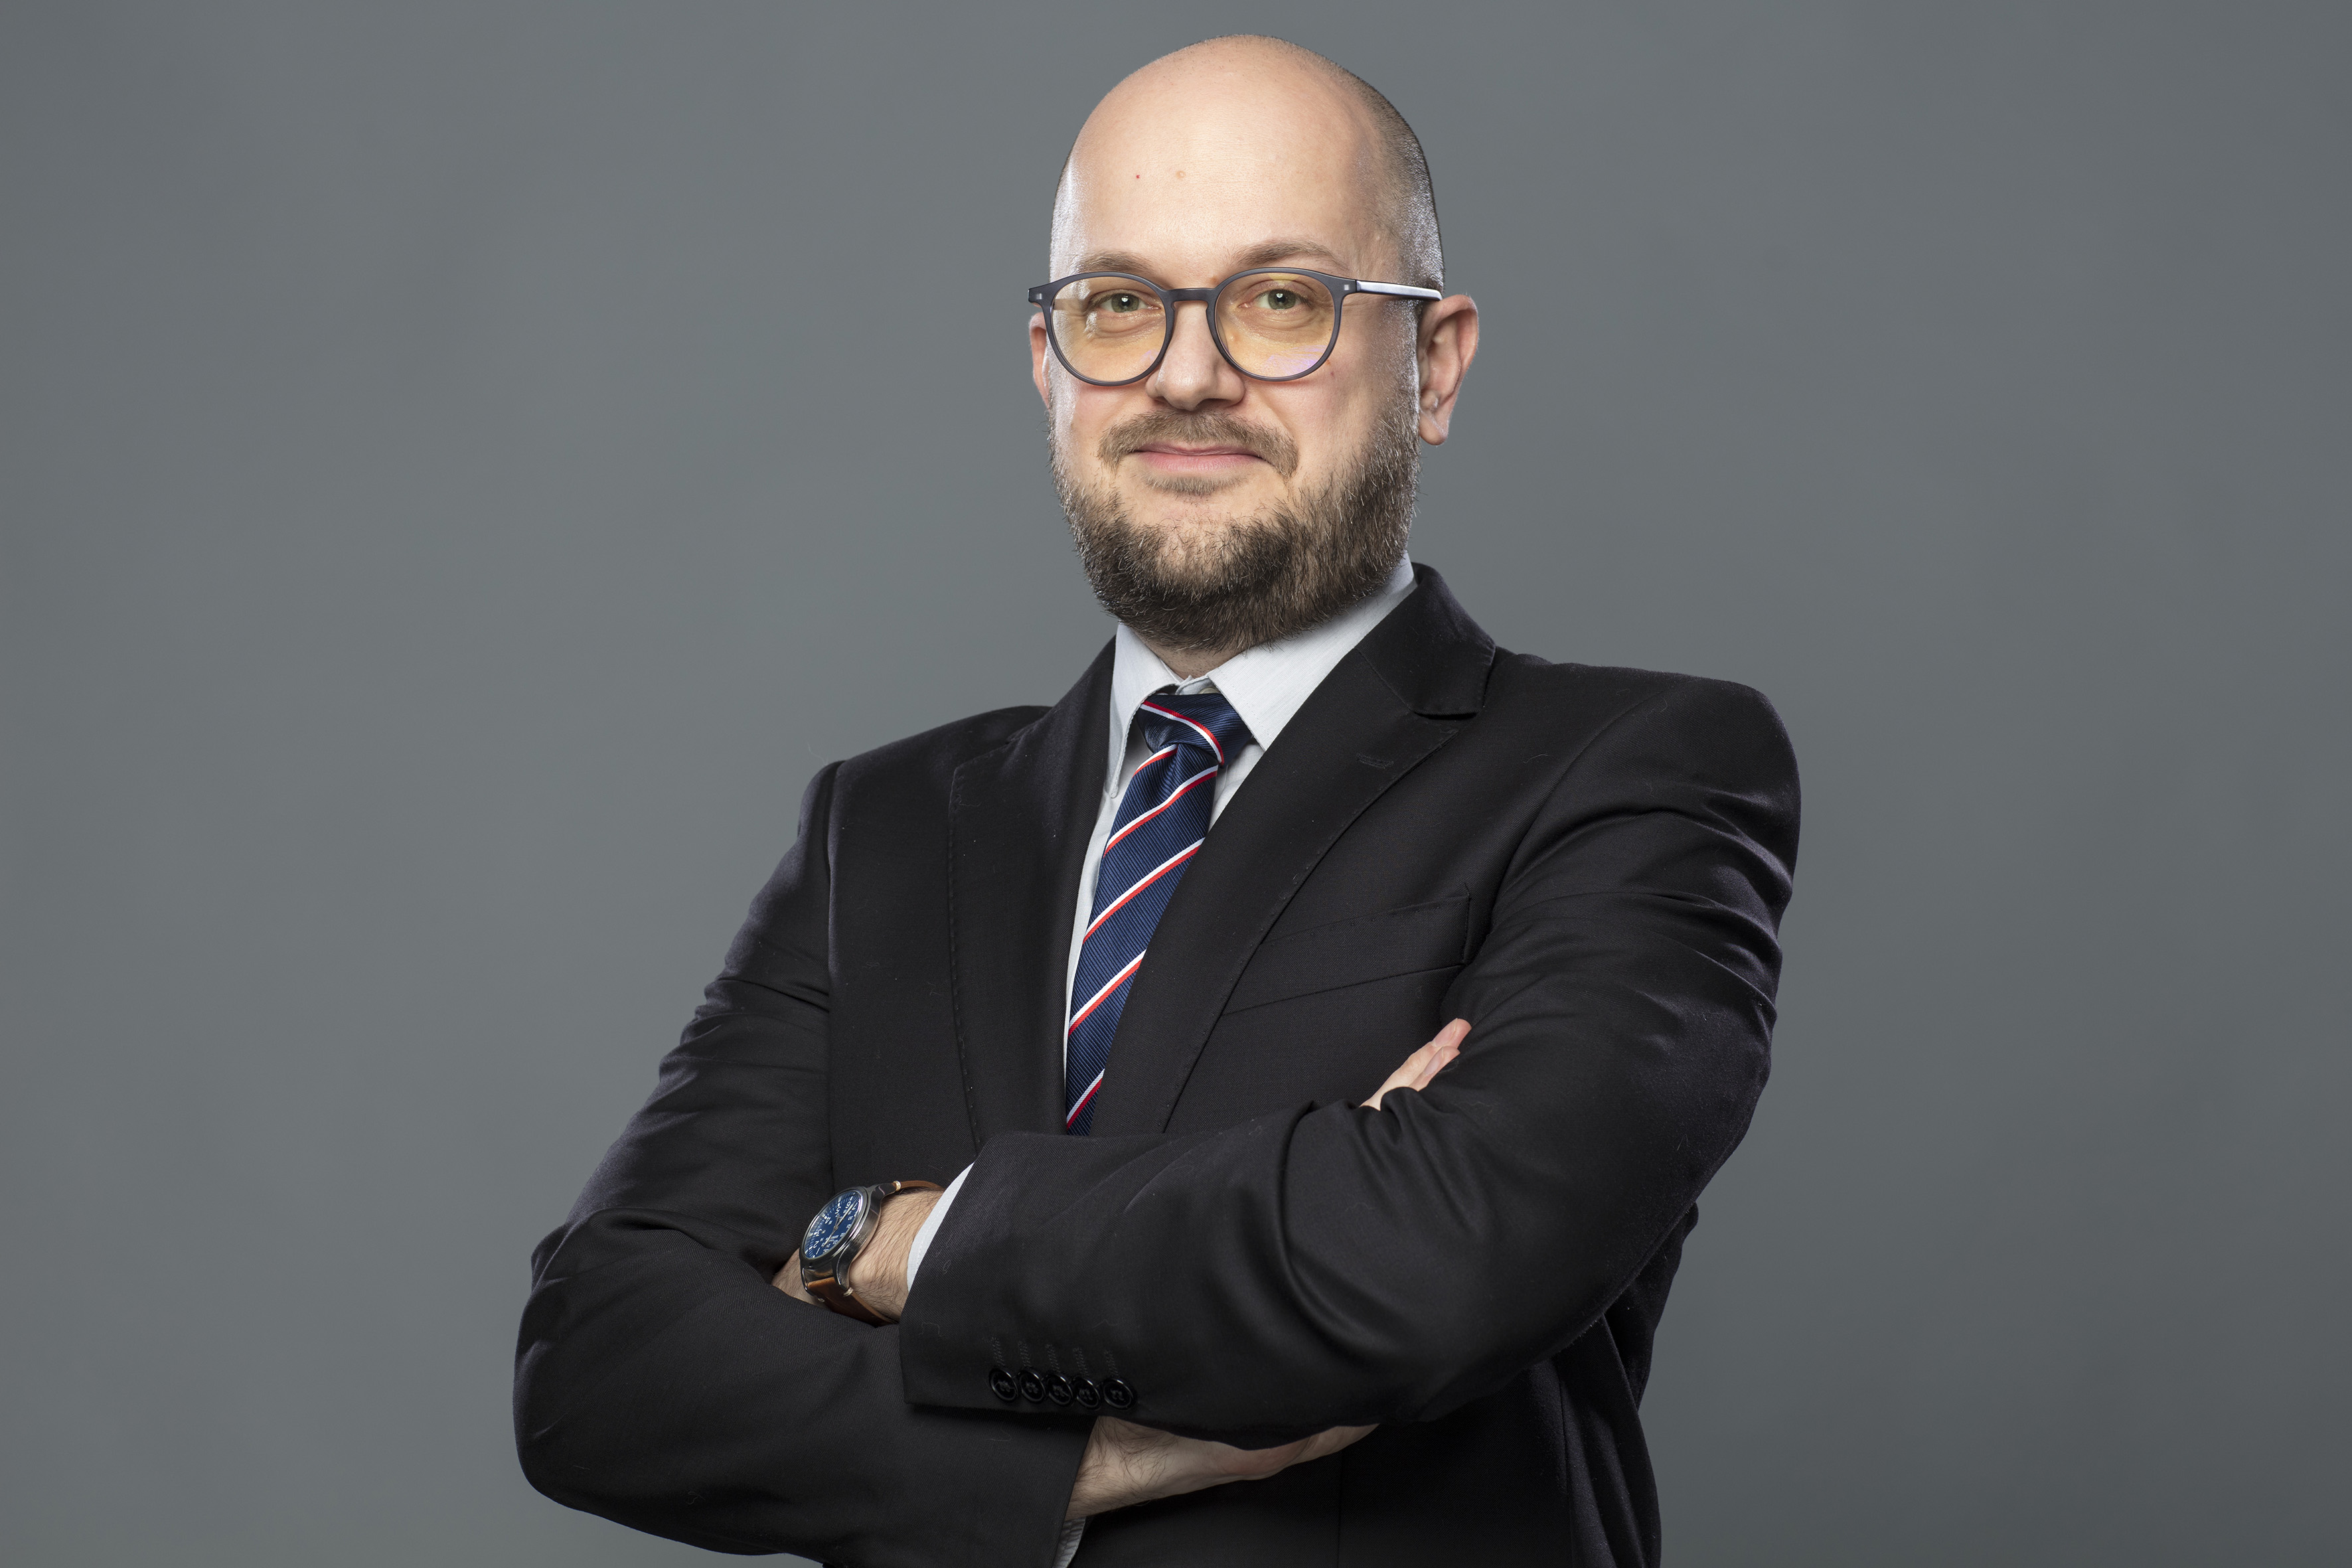 Adrian Woźniak